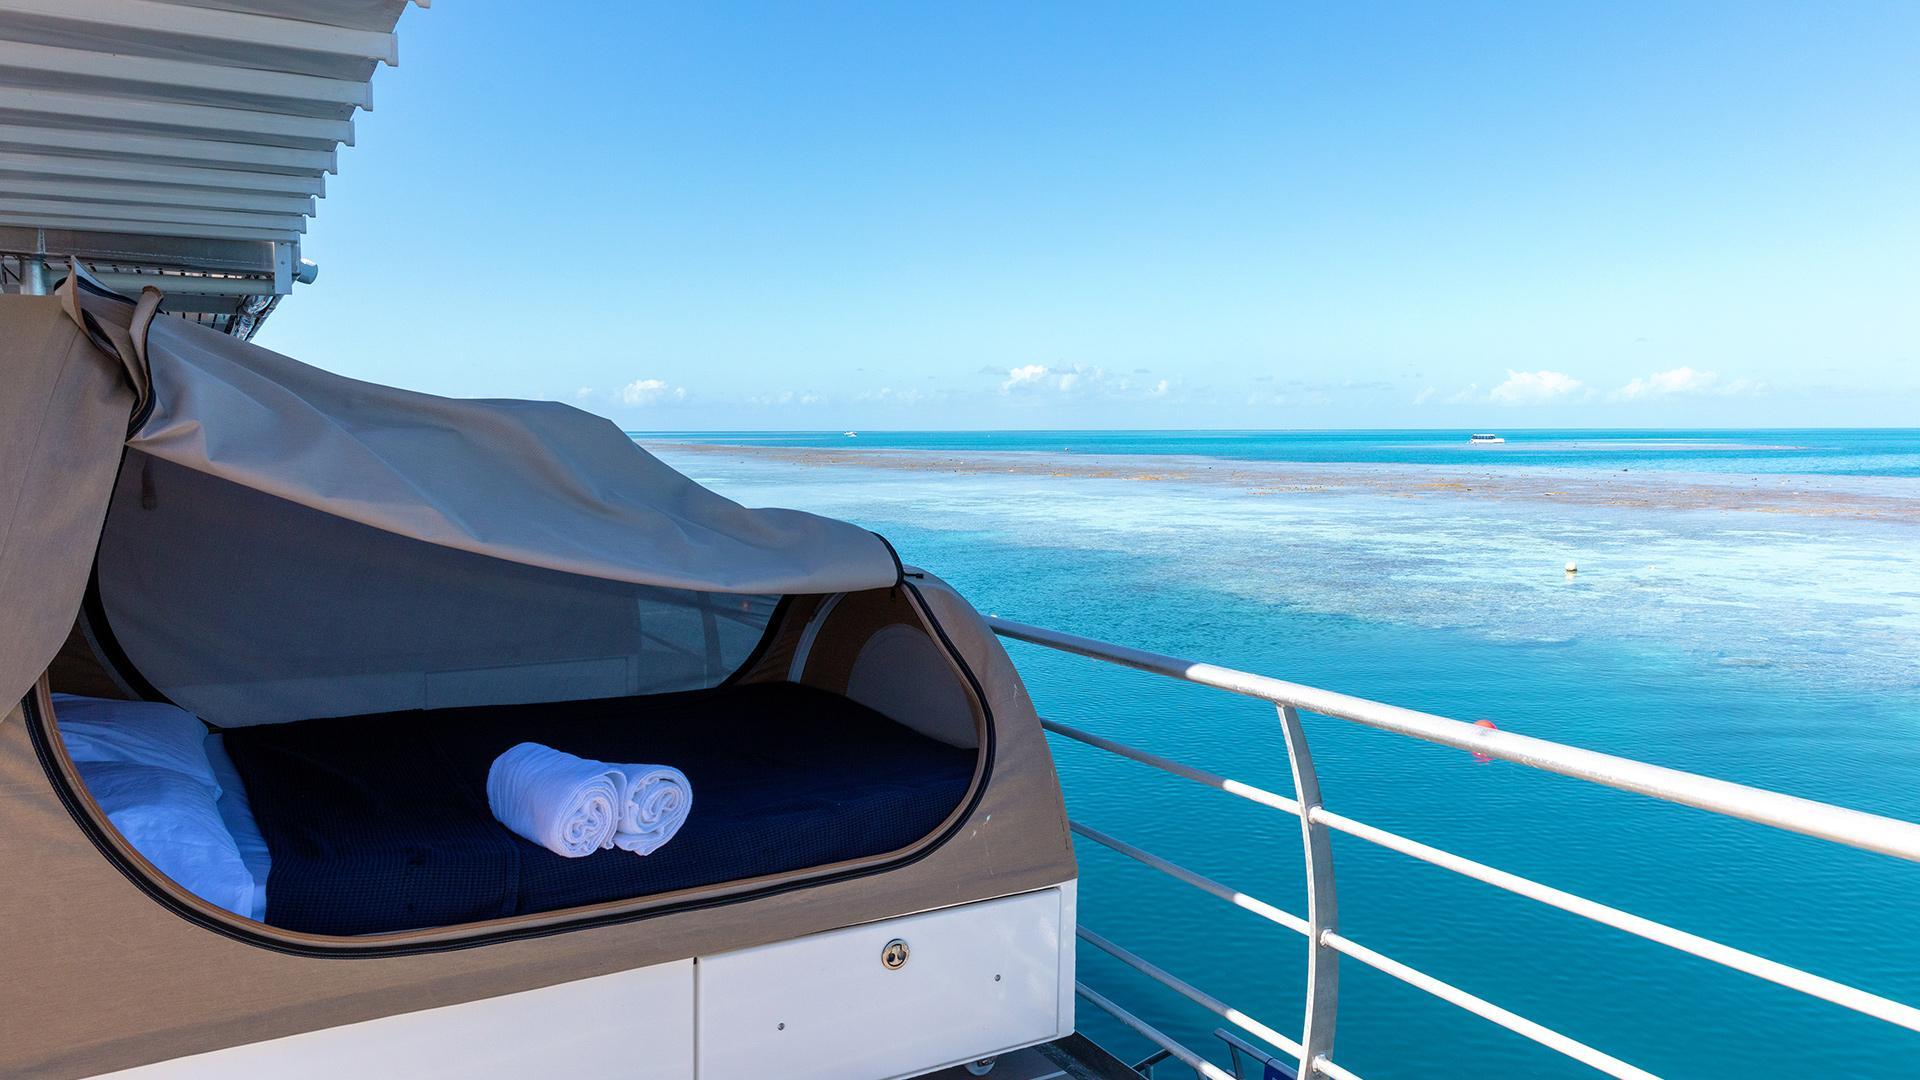 Reefbed (solo traveller) image 1 at Reefsleep — Cruise Whitsundays by Whitsunday Regional, Queensland, Australia